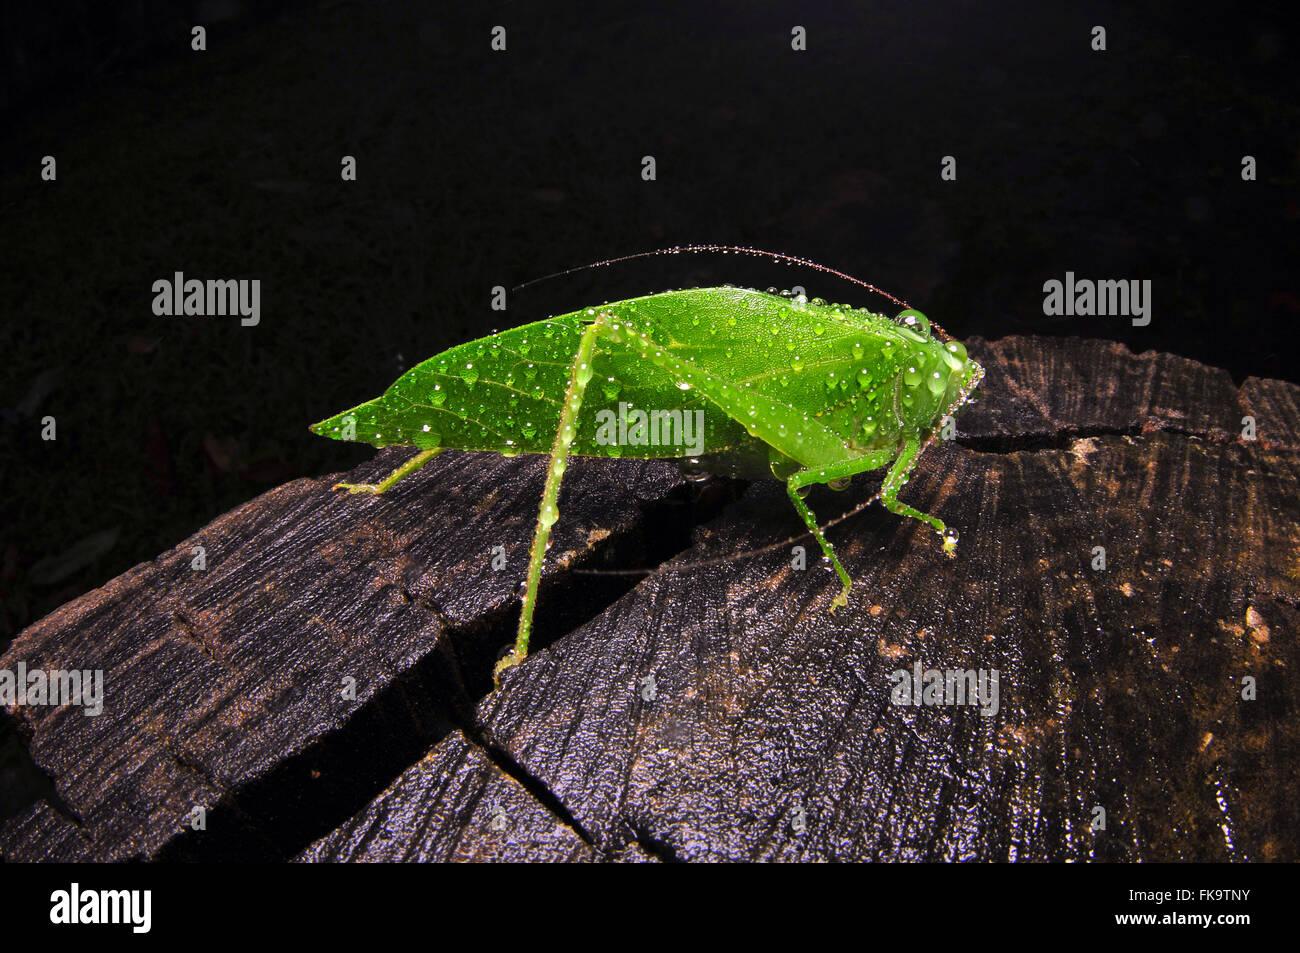 Silkworm sheet - Stock Image